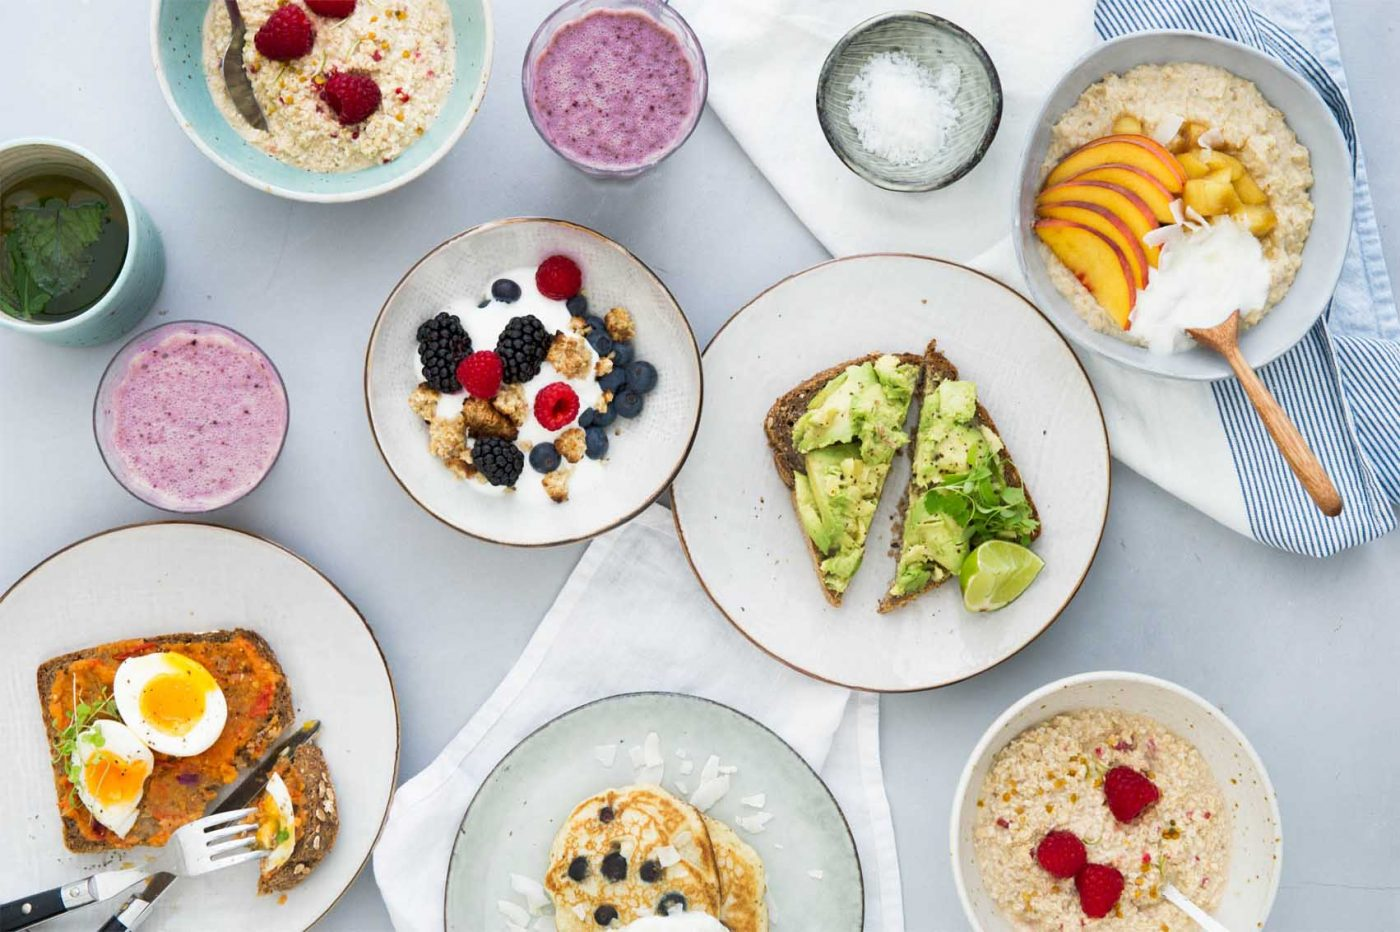 BreakfastLaydownhorizontal